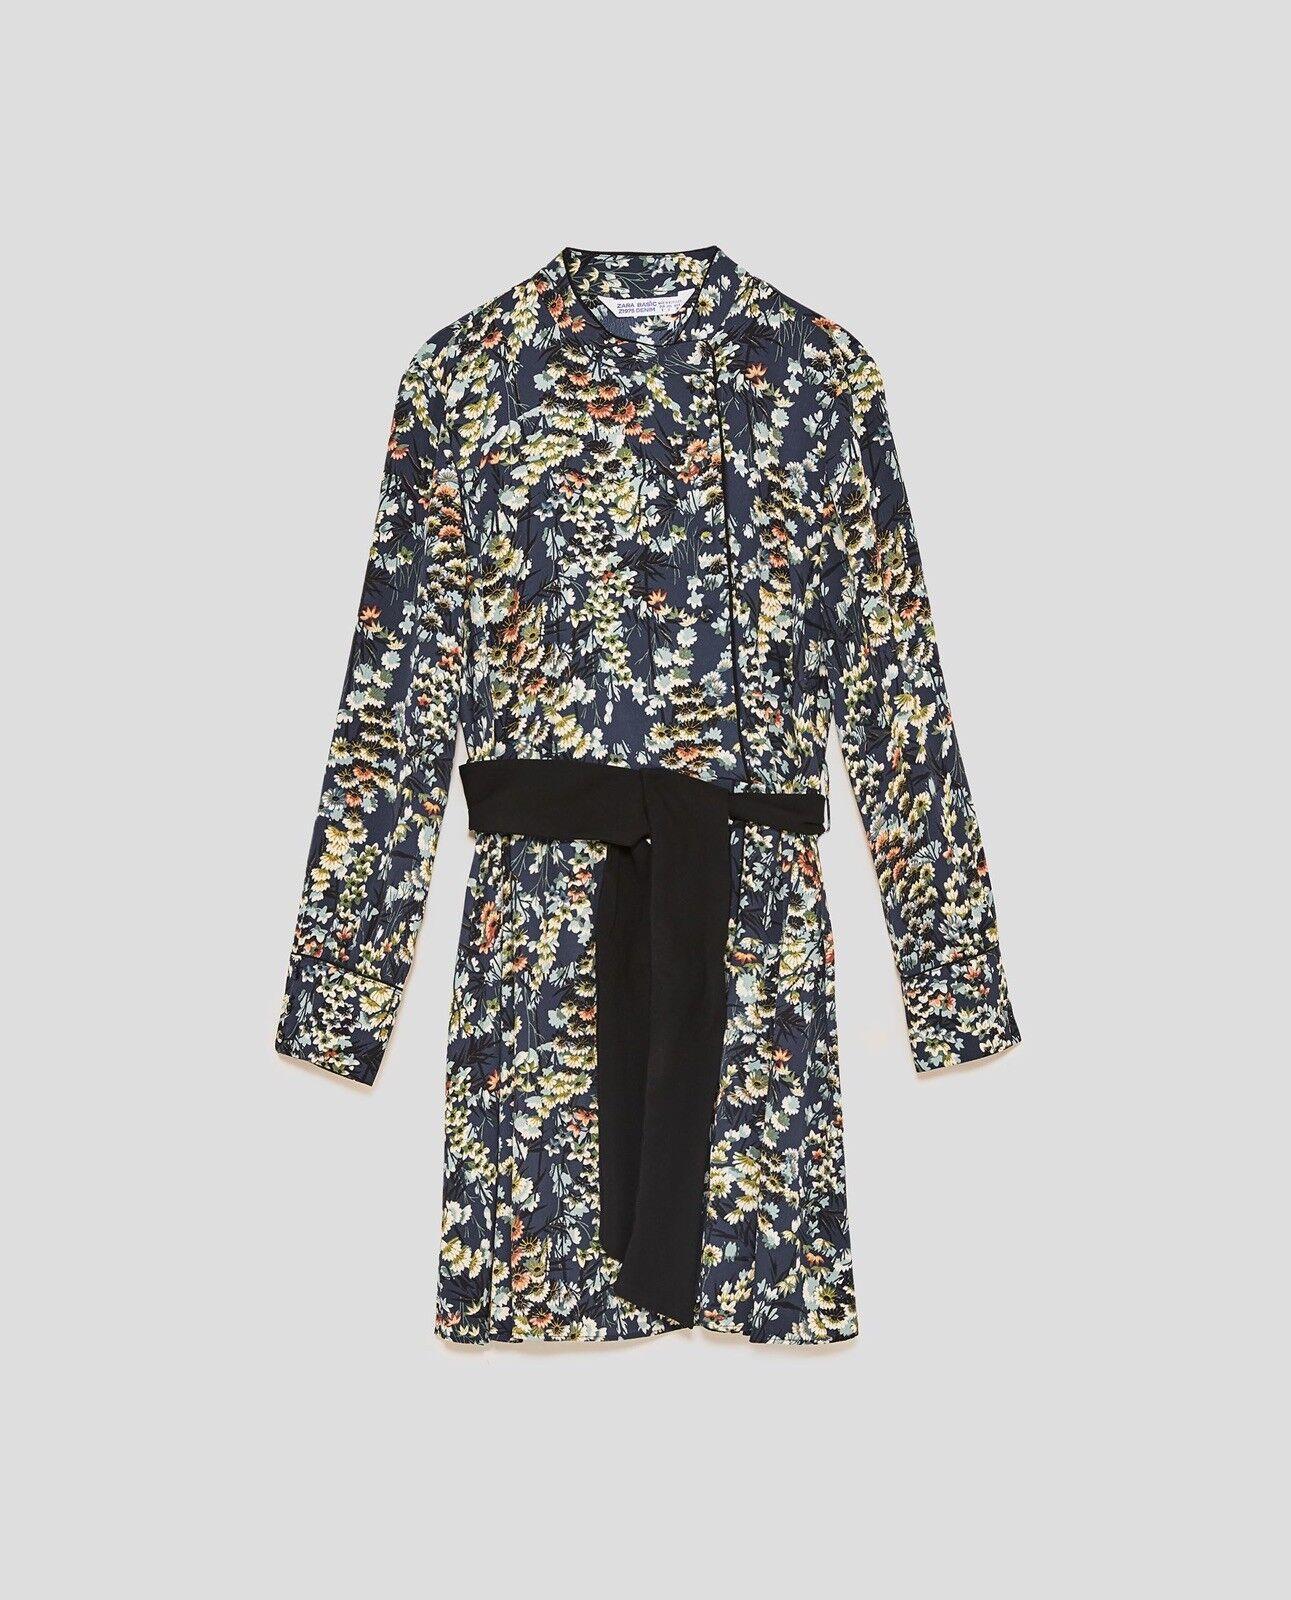 Zara damen Floral Dress With Contrasting Print Größe M NWT